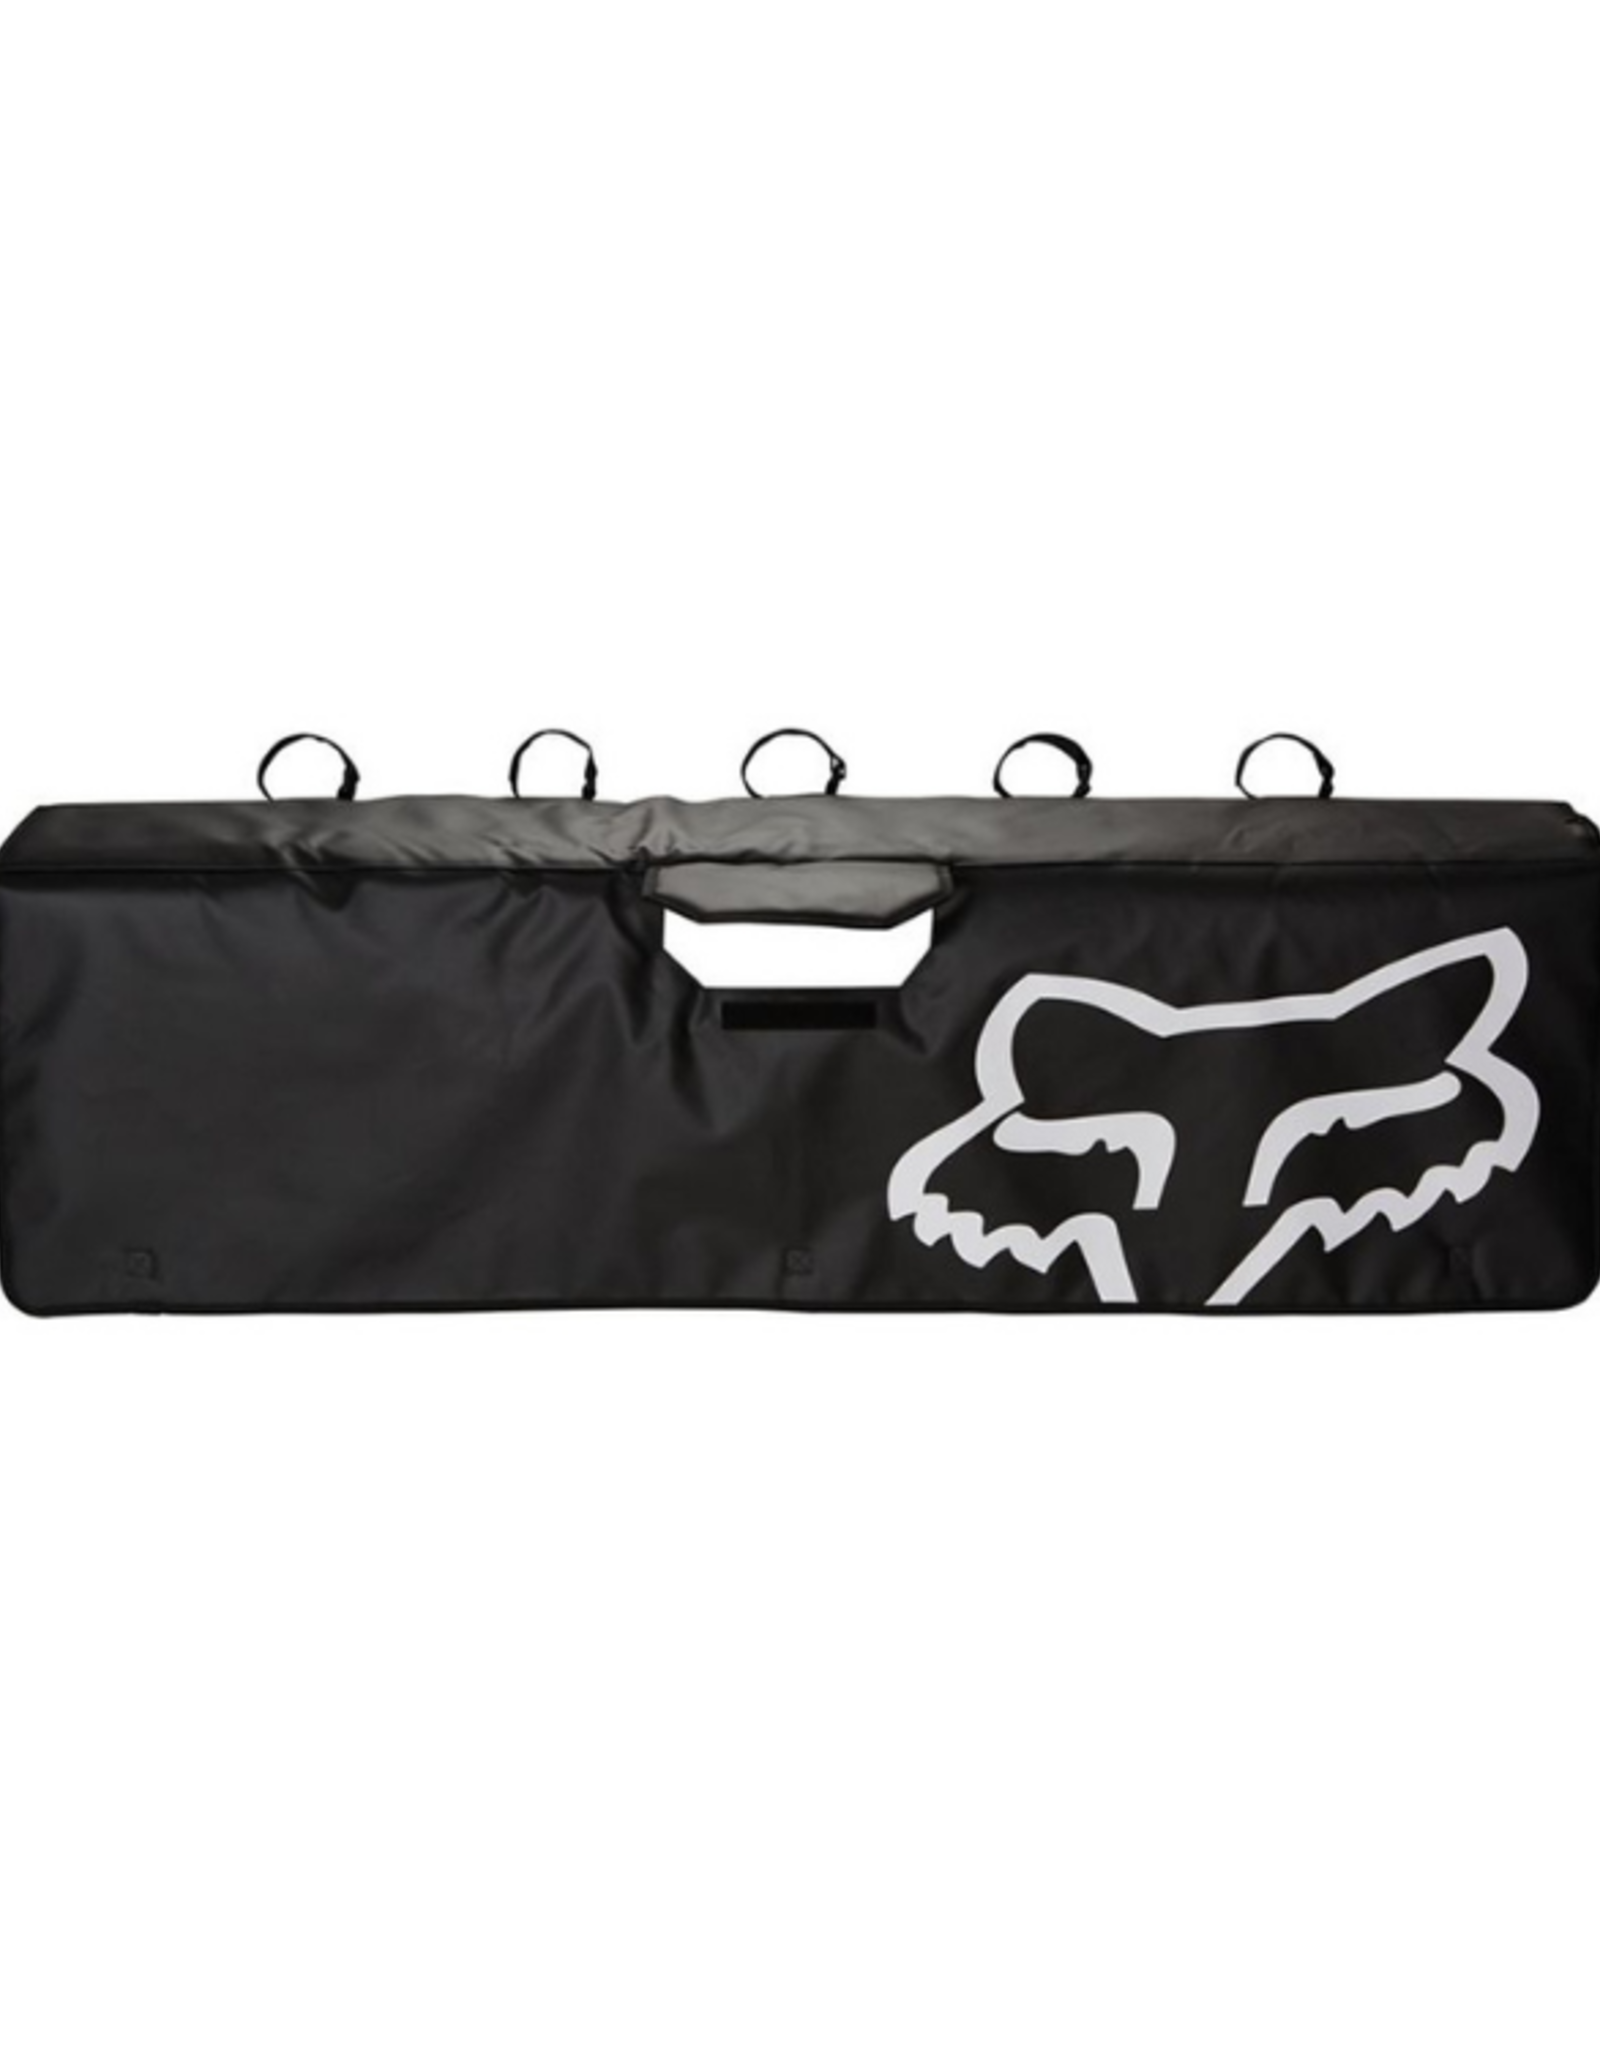 Fox Racing Fox Racing Tailgate Cover: Black Small